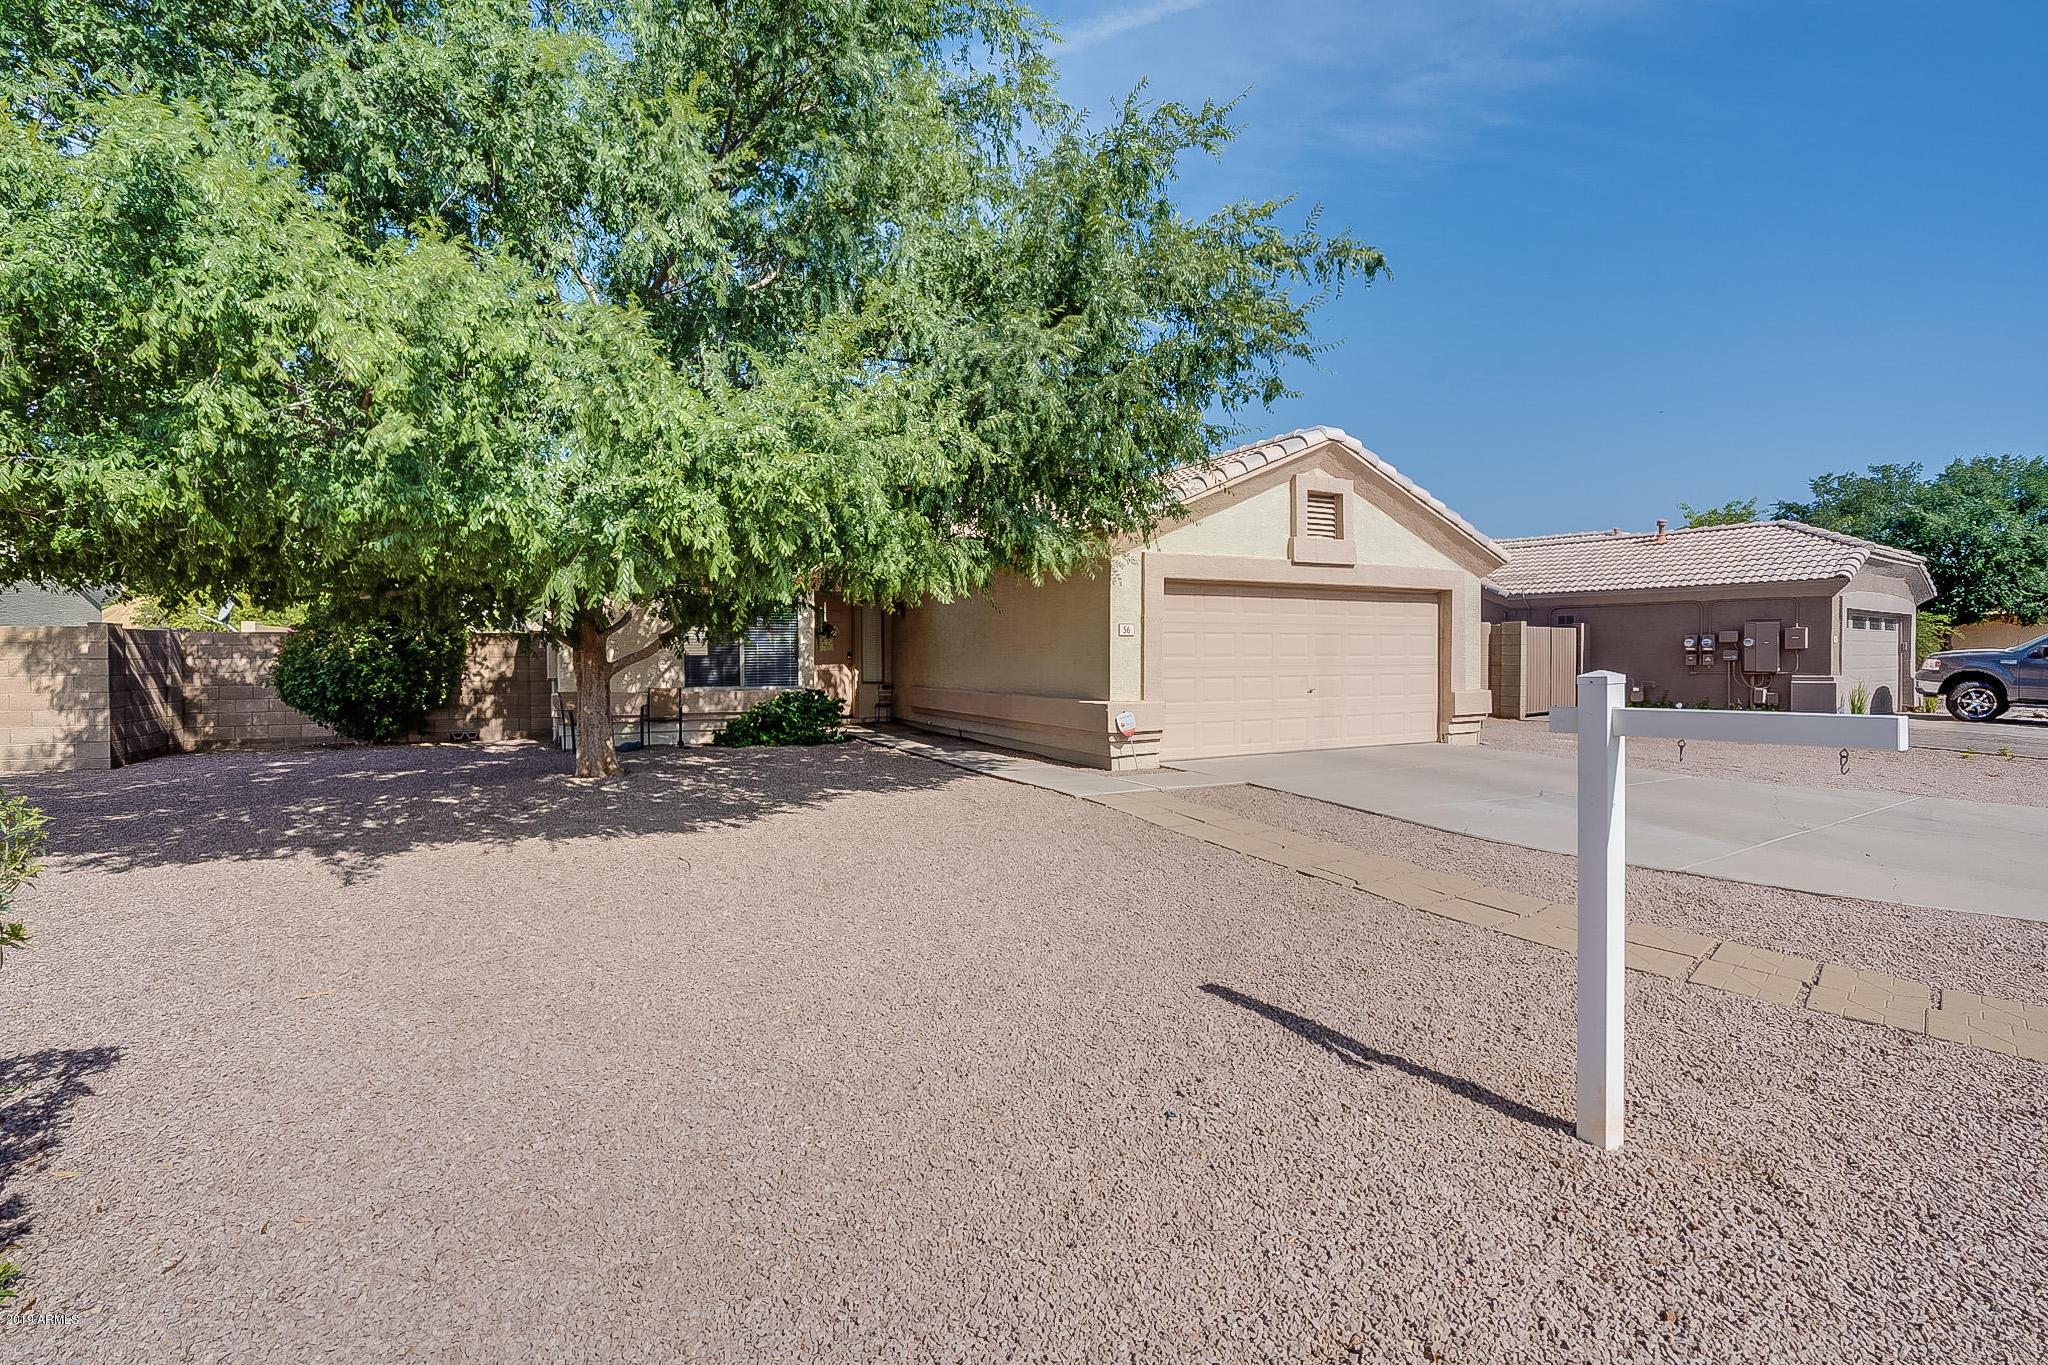 Photo of 56 S MONTEREY Street, Gilbert, AZ 85233